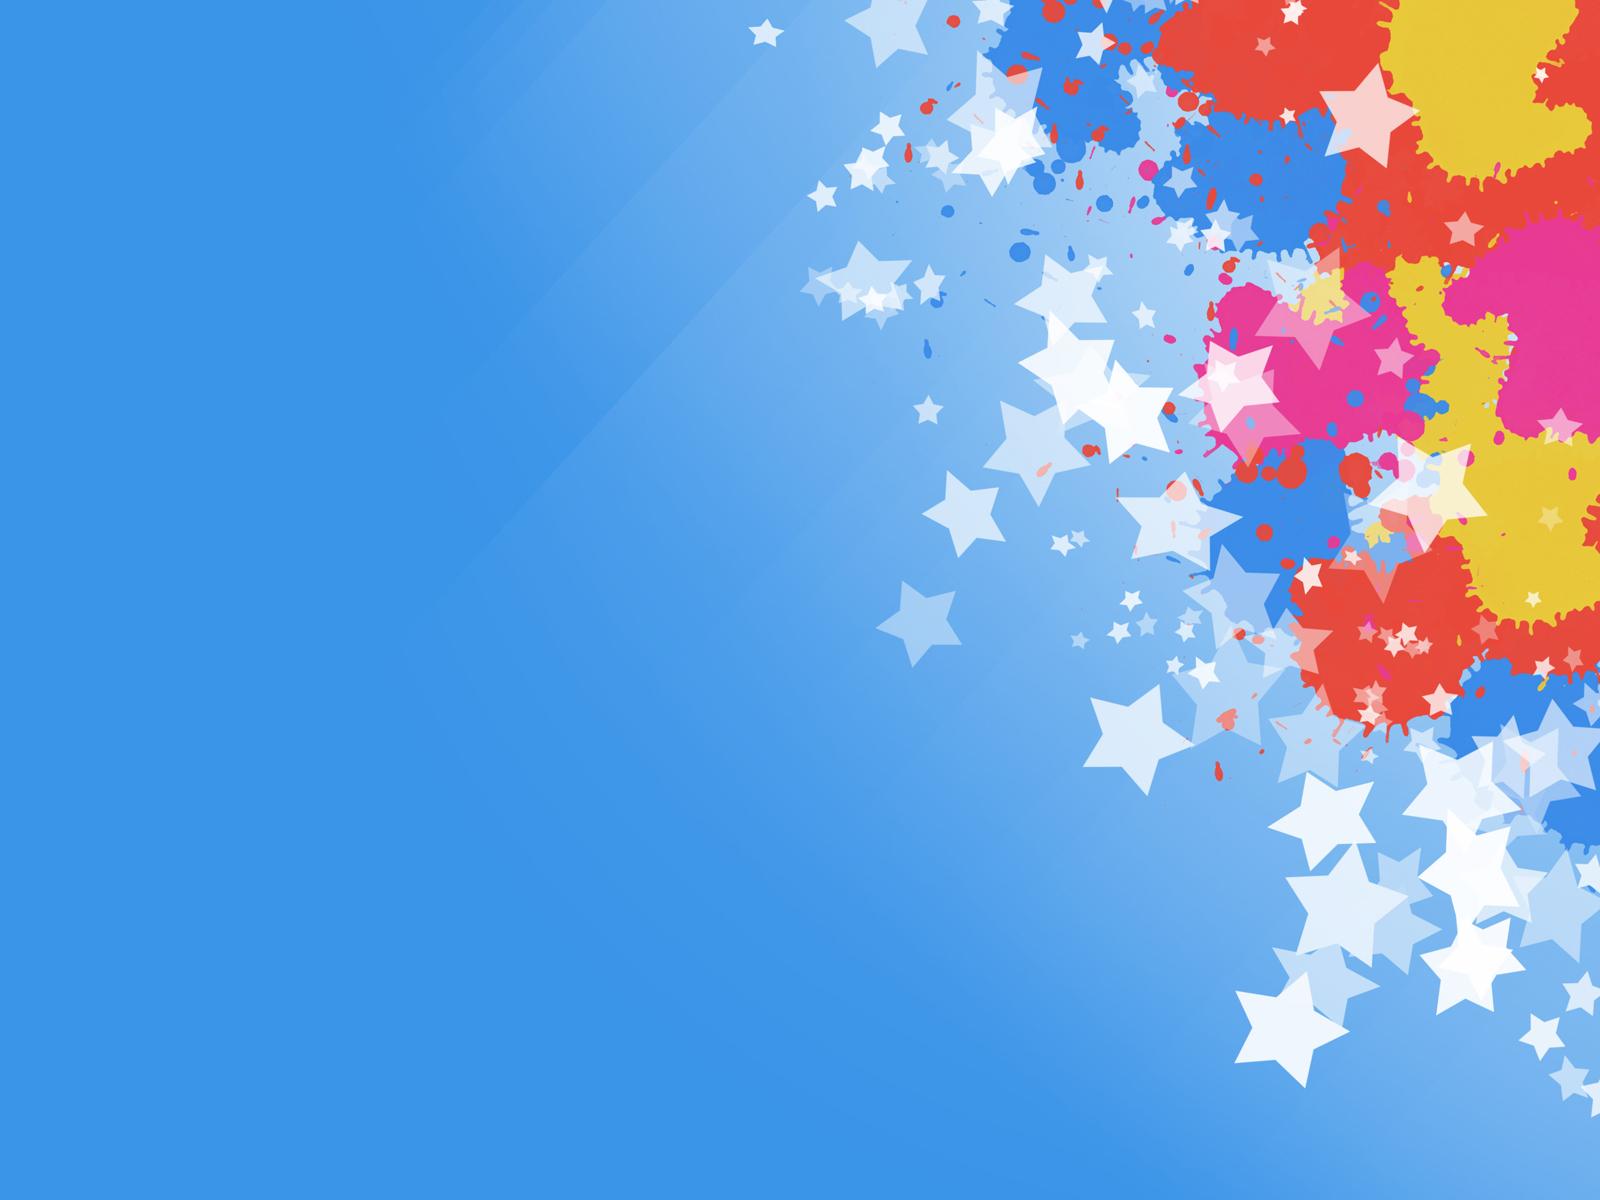 free celebration images free  download free clip art  free free fireworks clipart image free fireworks clipart downloads